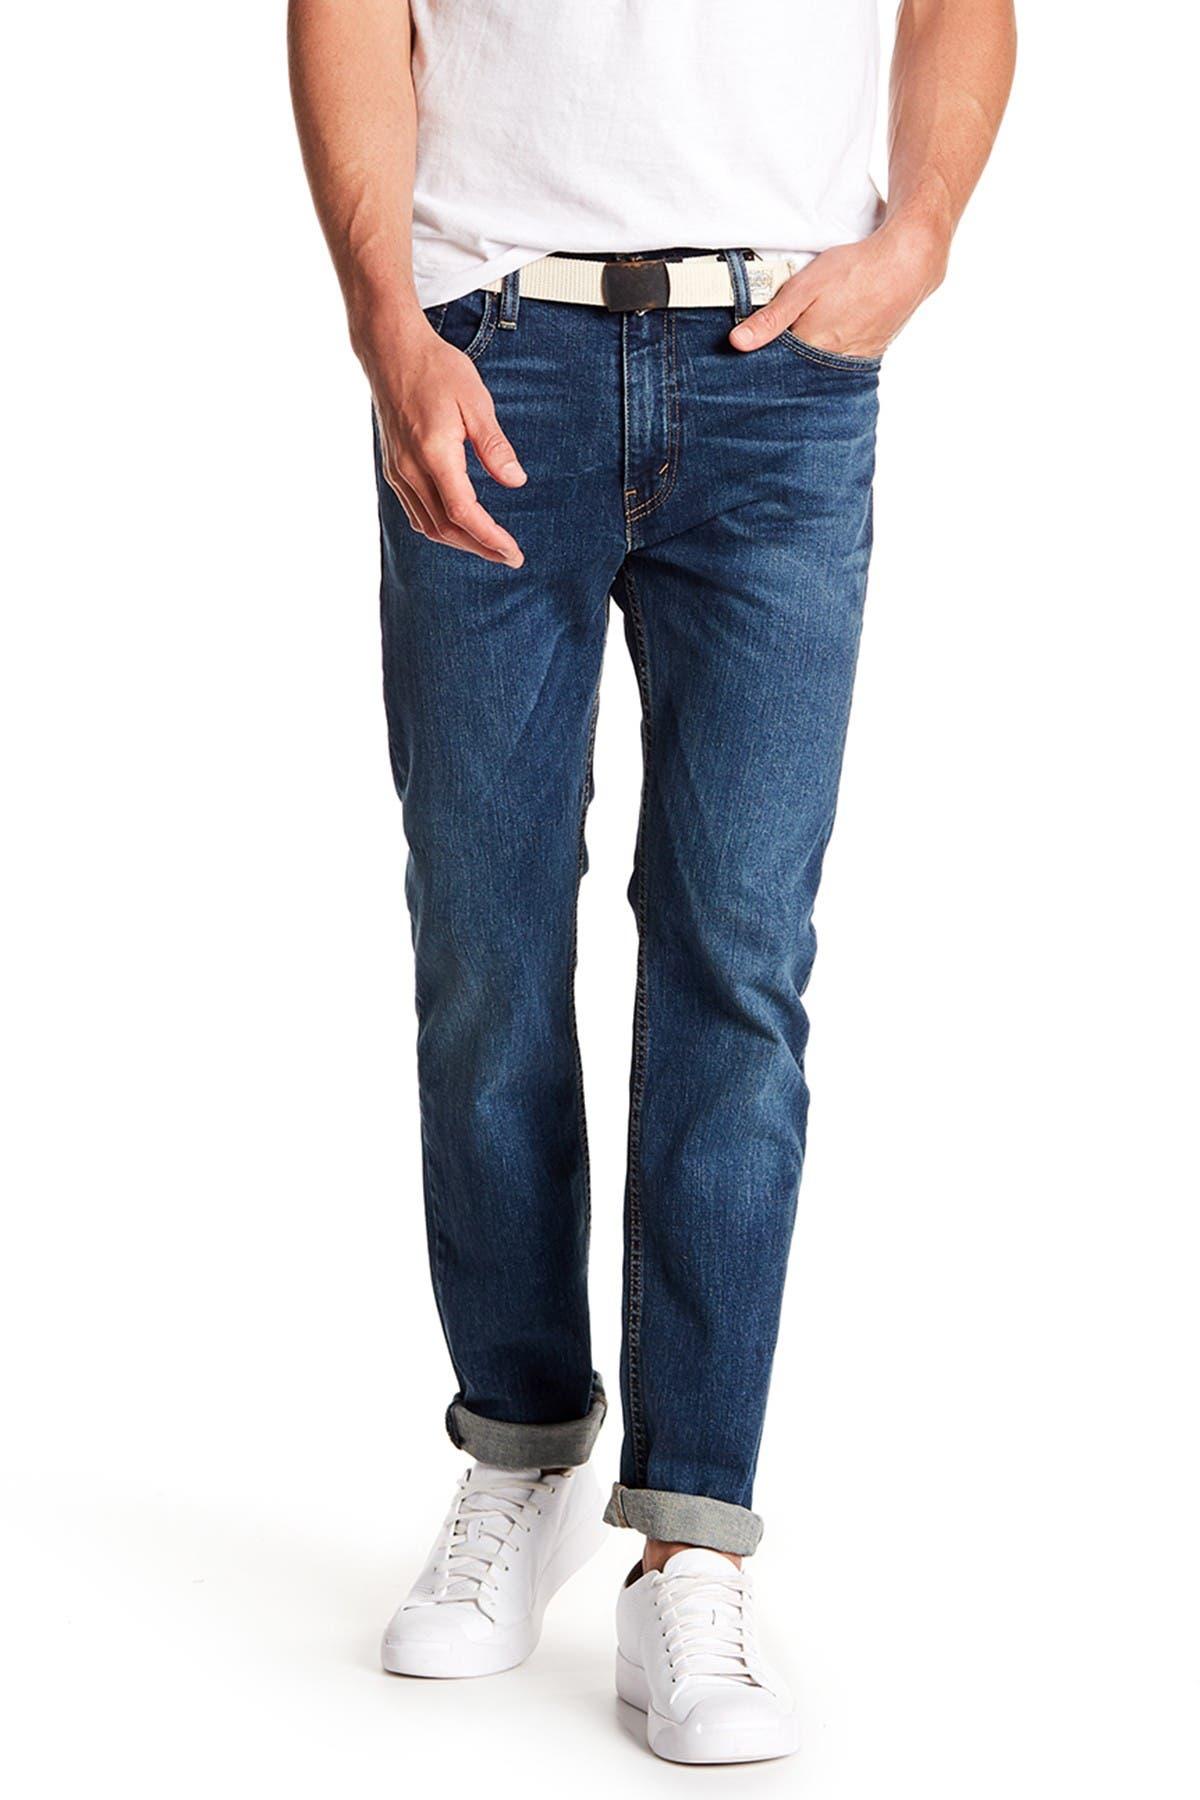 "Image of Levi's 513 Vines Slim Straight Fit Jeans - 30-34"" Inseam"